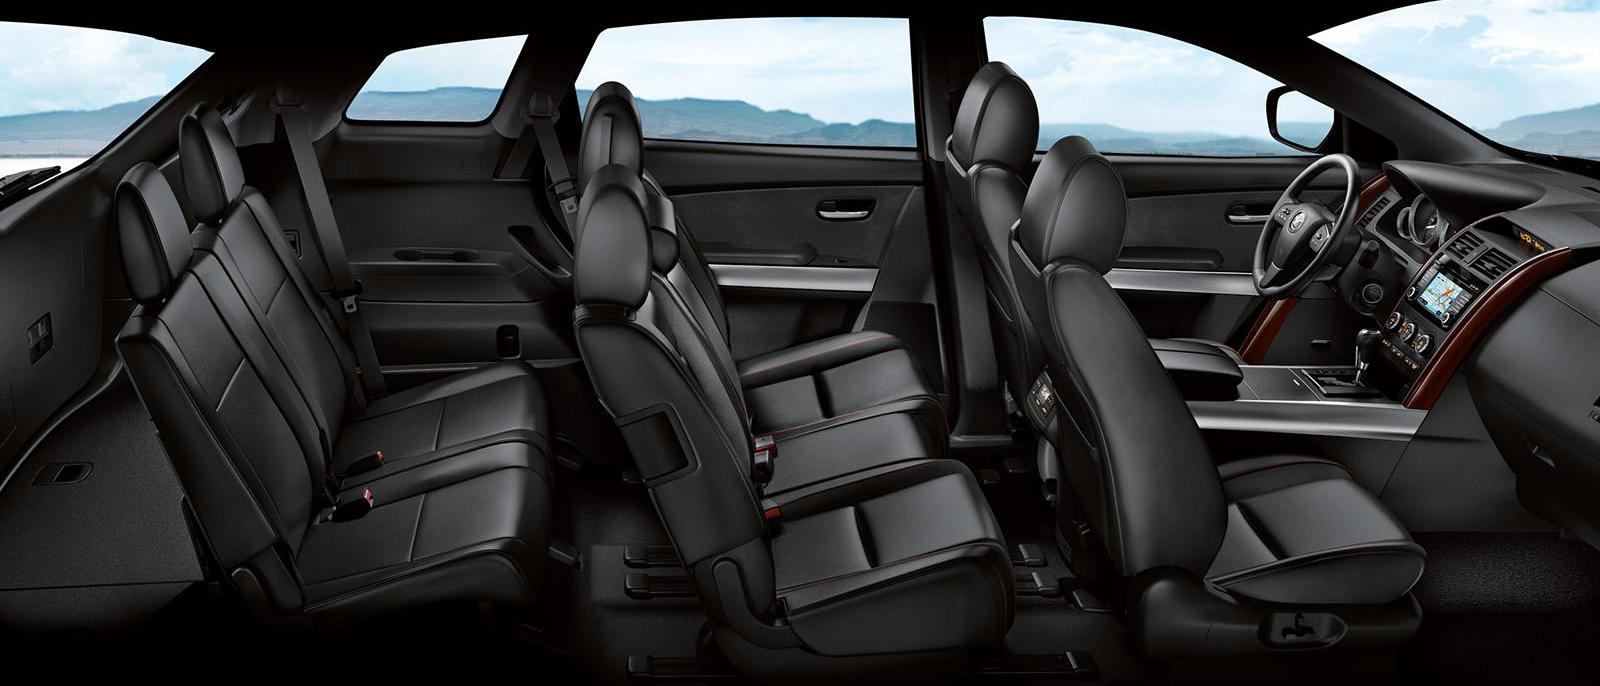 2015 Mazda5 interior